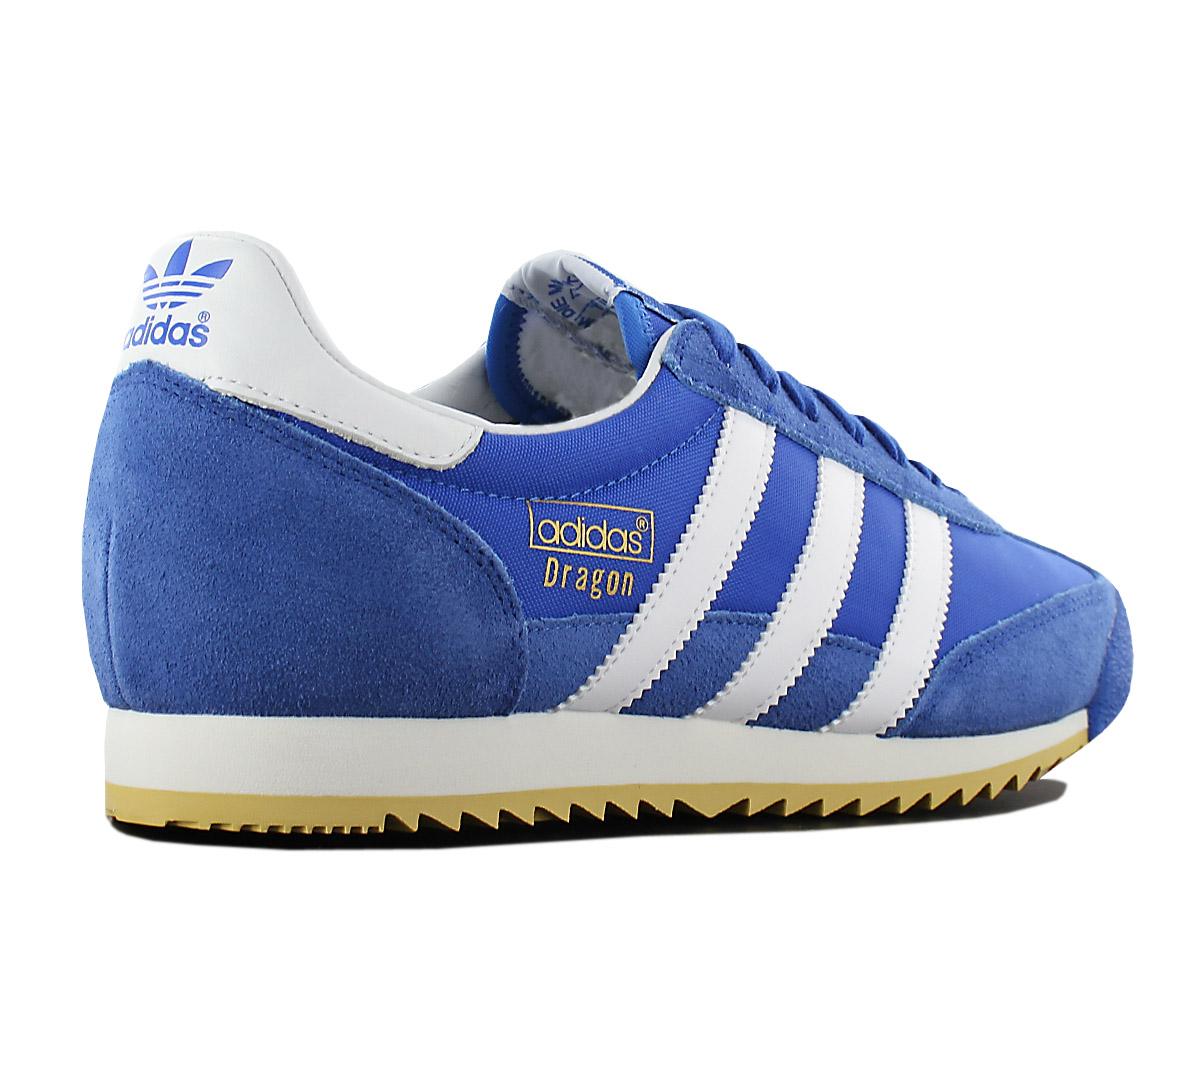 new concept 71a19 28aee Adidas Originals Dragon Vintage Men s Sneakers Shoes Blue S32087 Gym ...